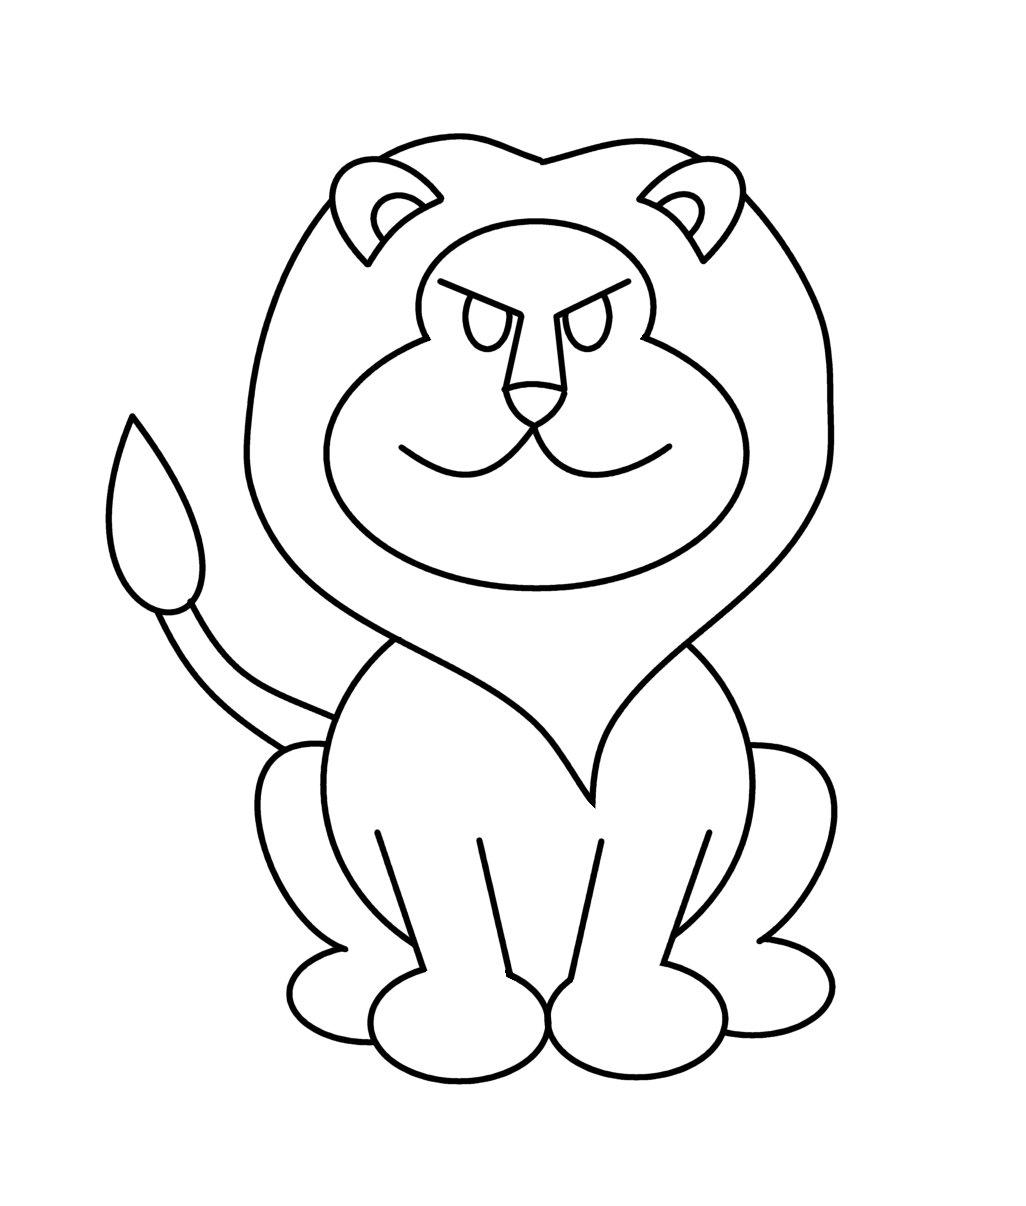 lion cartoon drawings wallpaper - photo #18